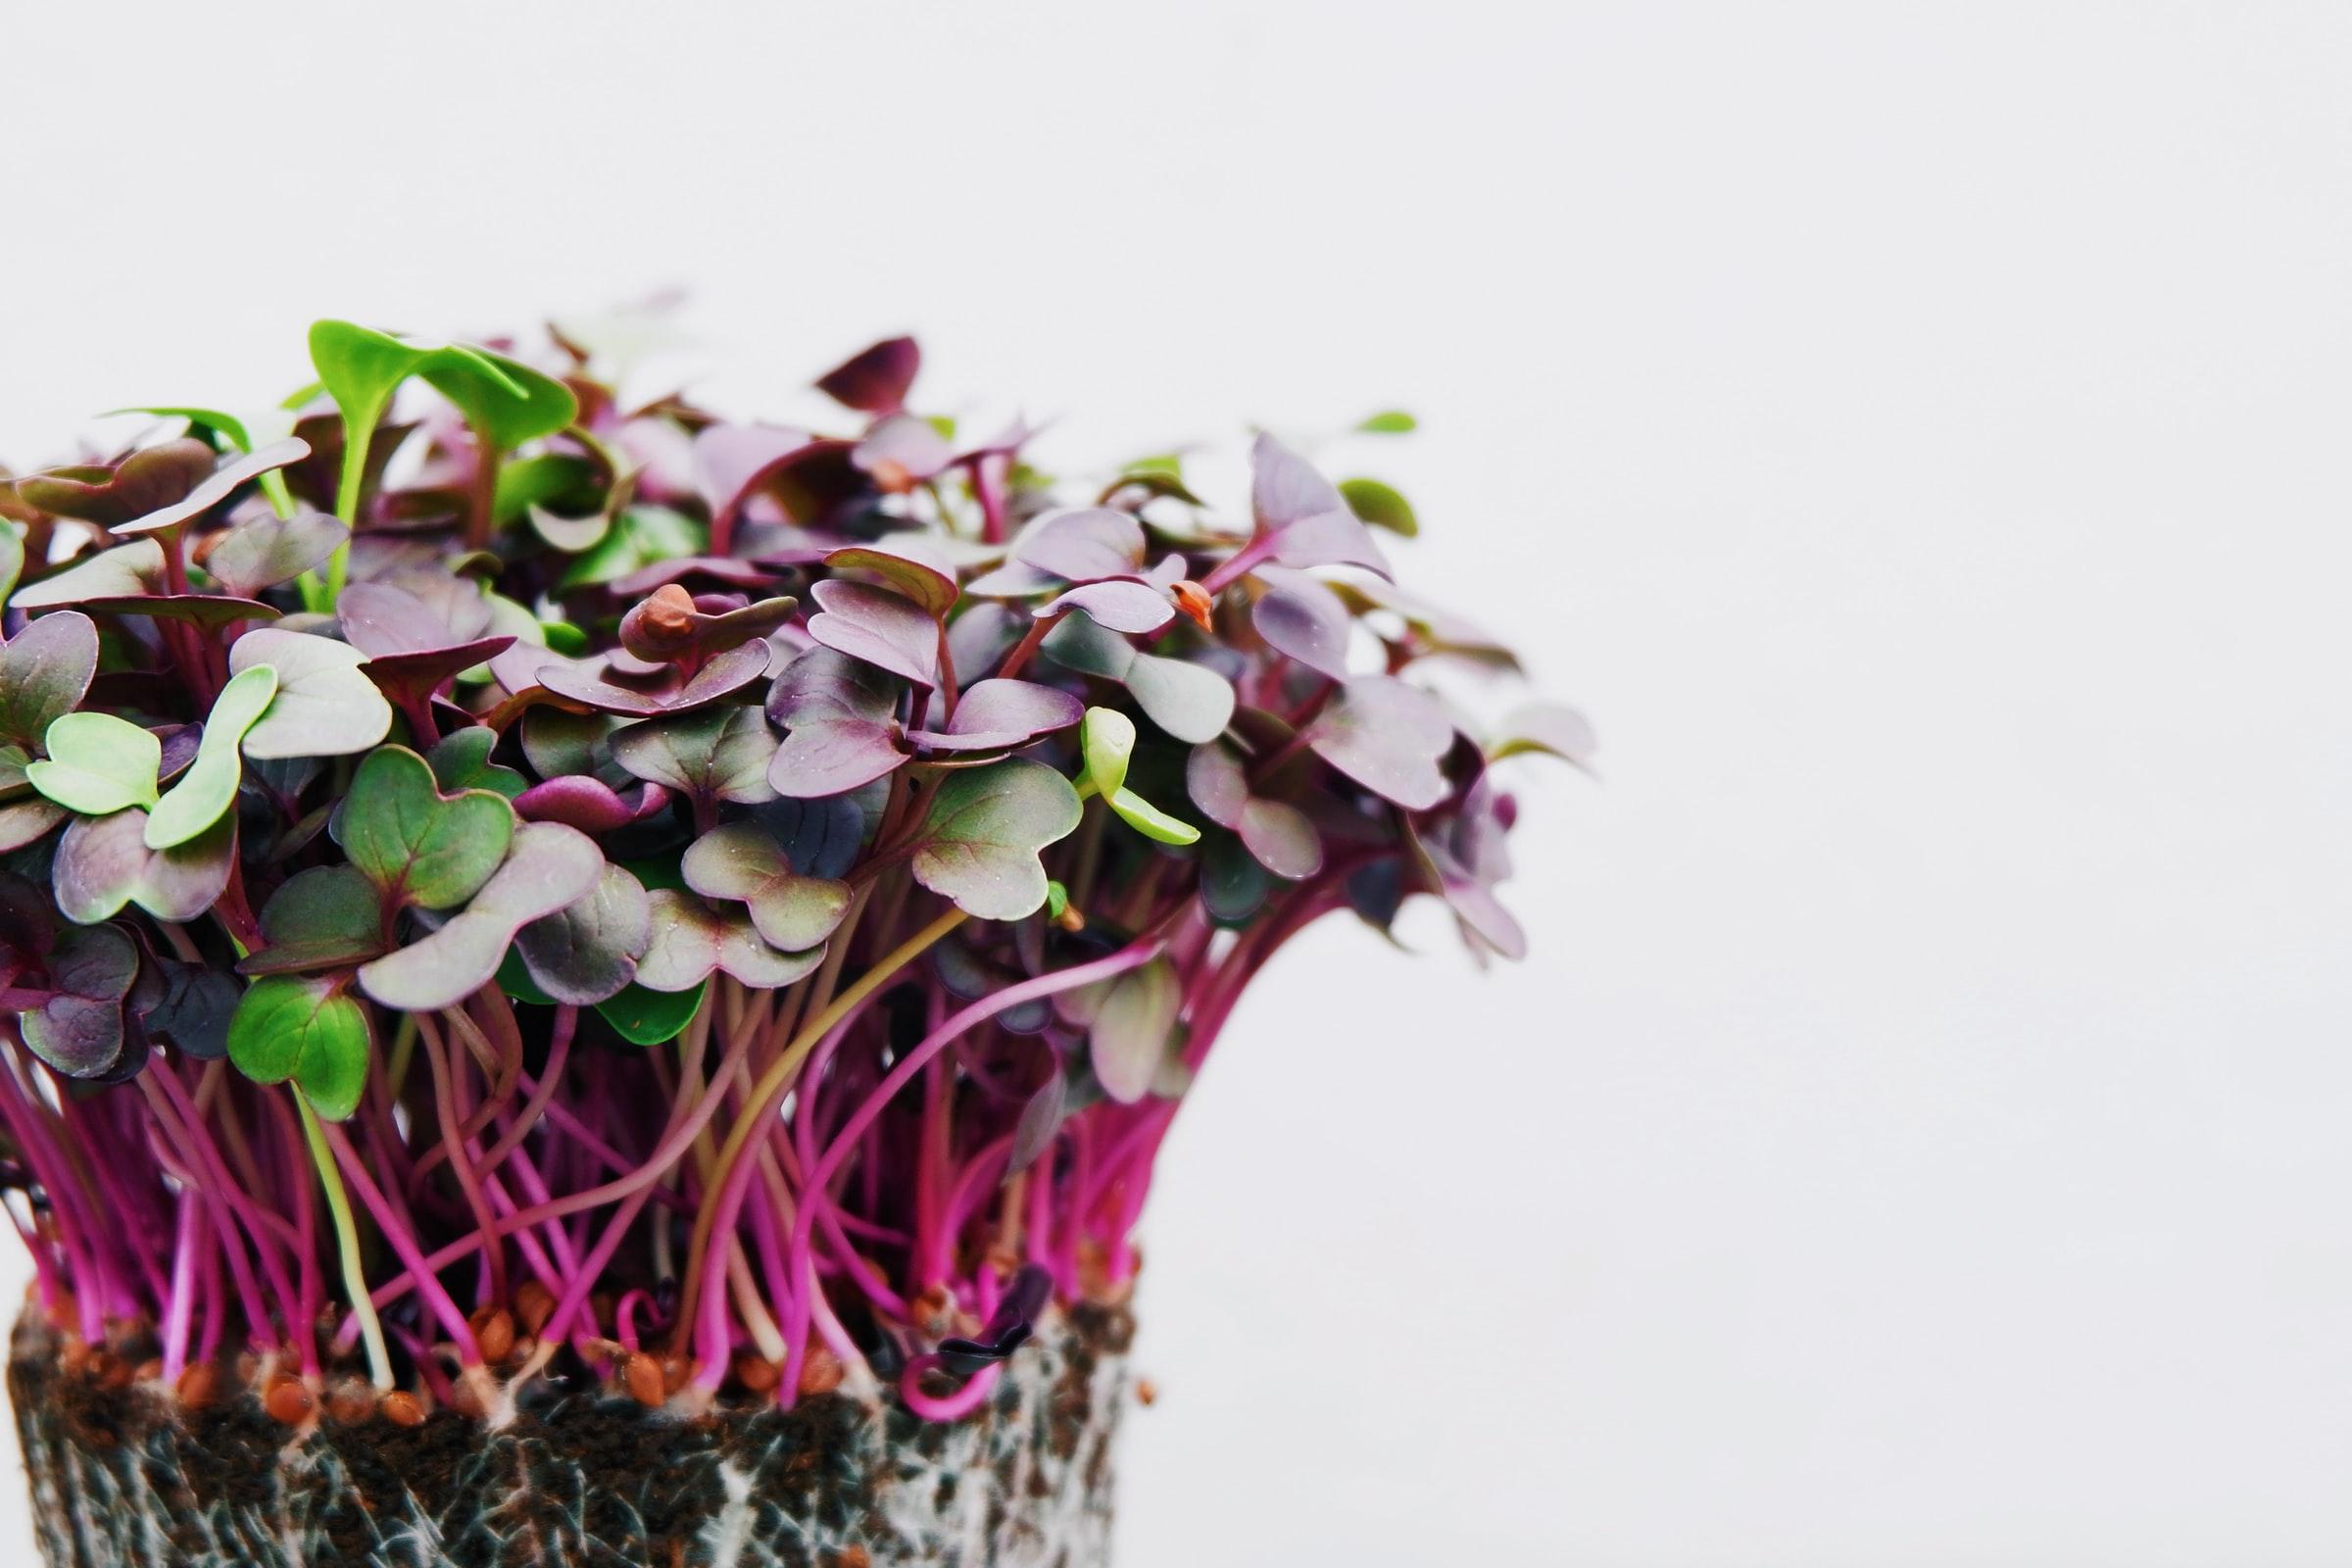 red brassica micropousses germinations jeunes pousses